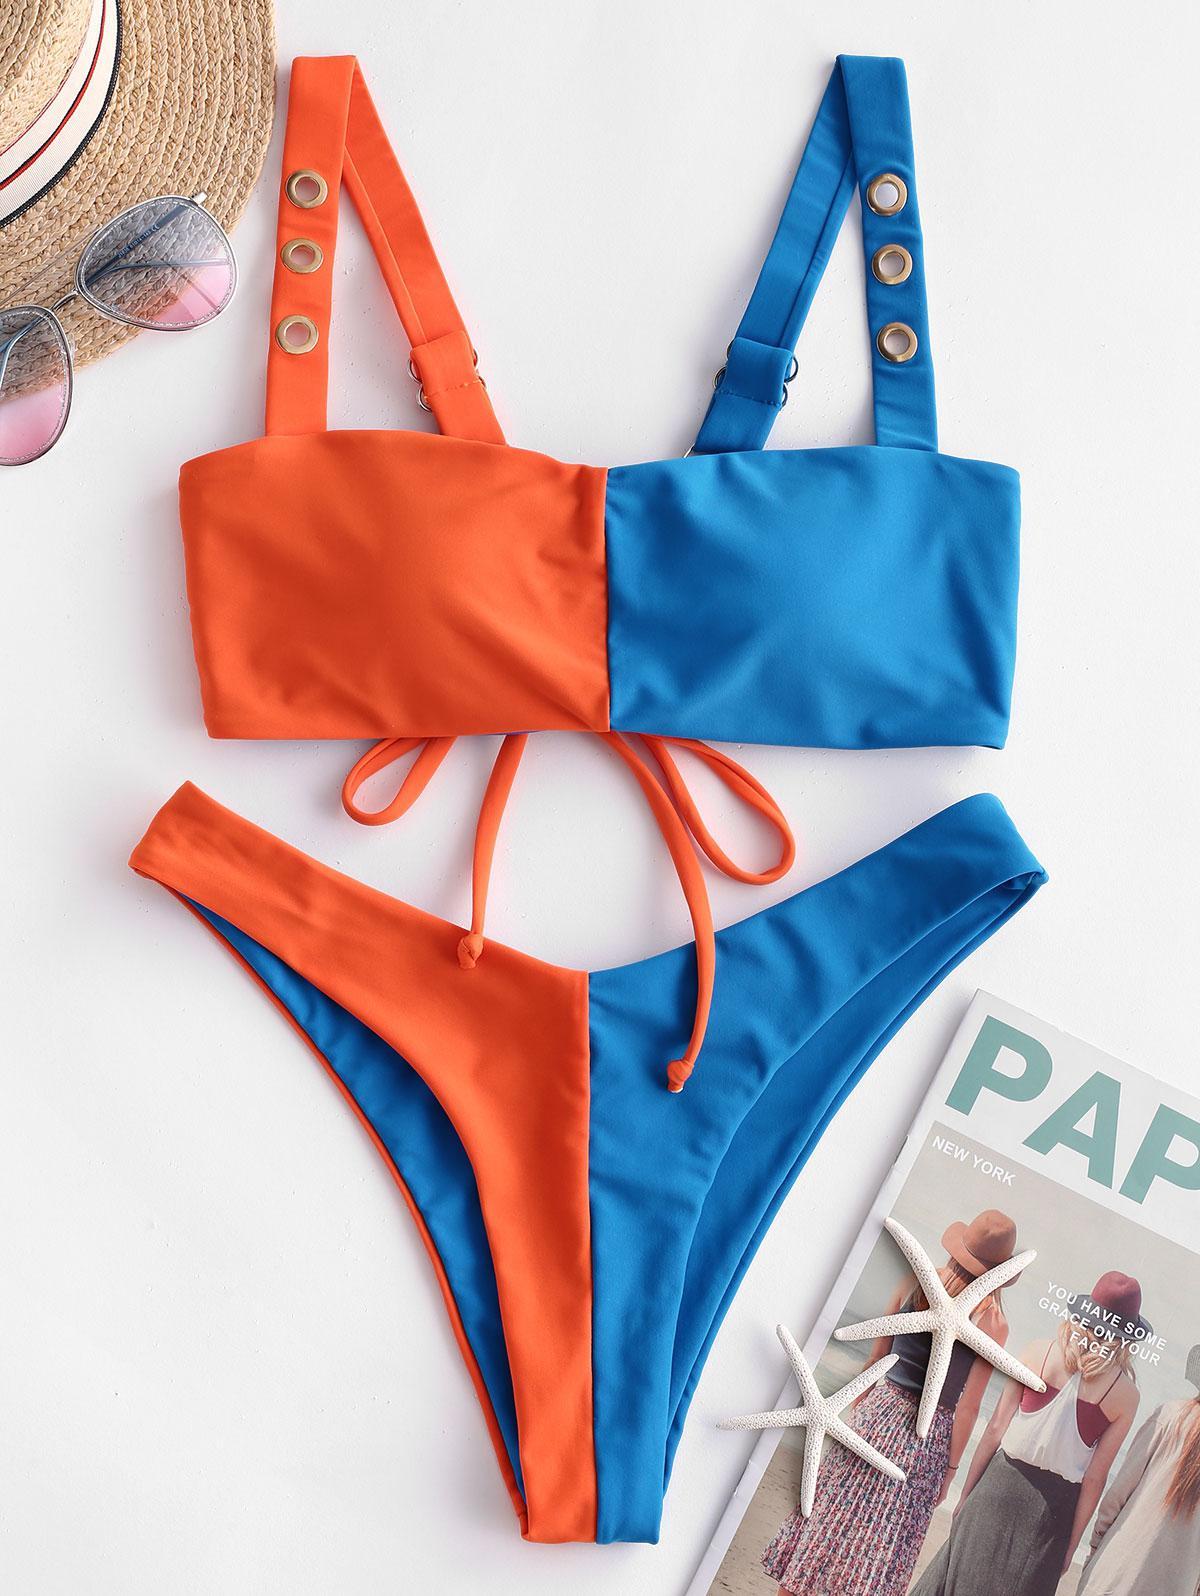 ZAFUL Color Block Grommets High Leg Bikini Swimsuit, Ocean blue